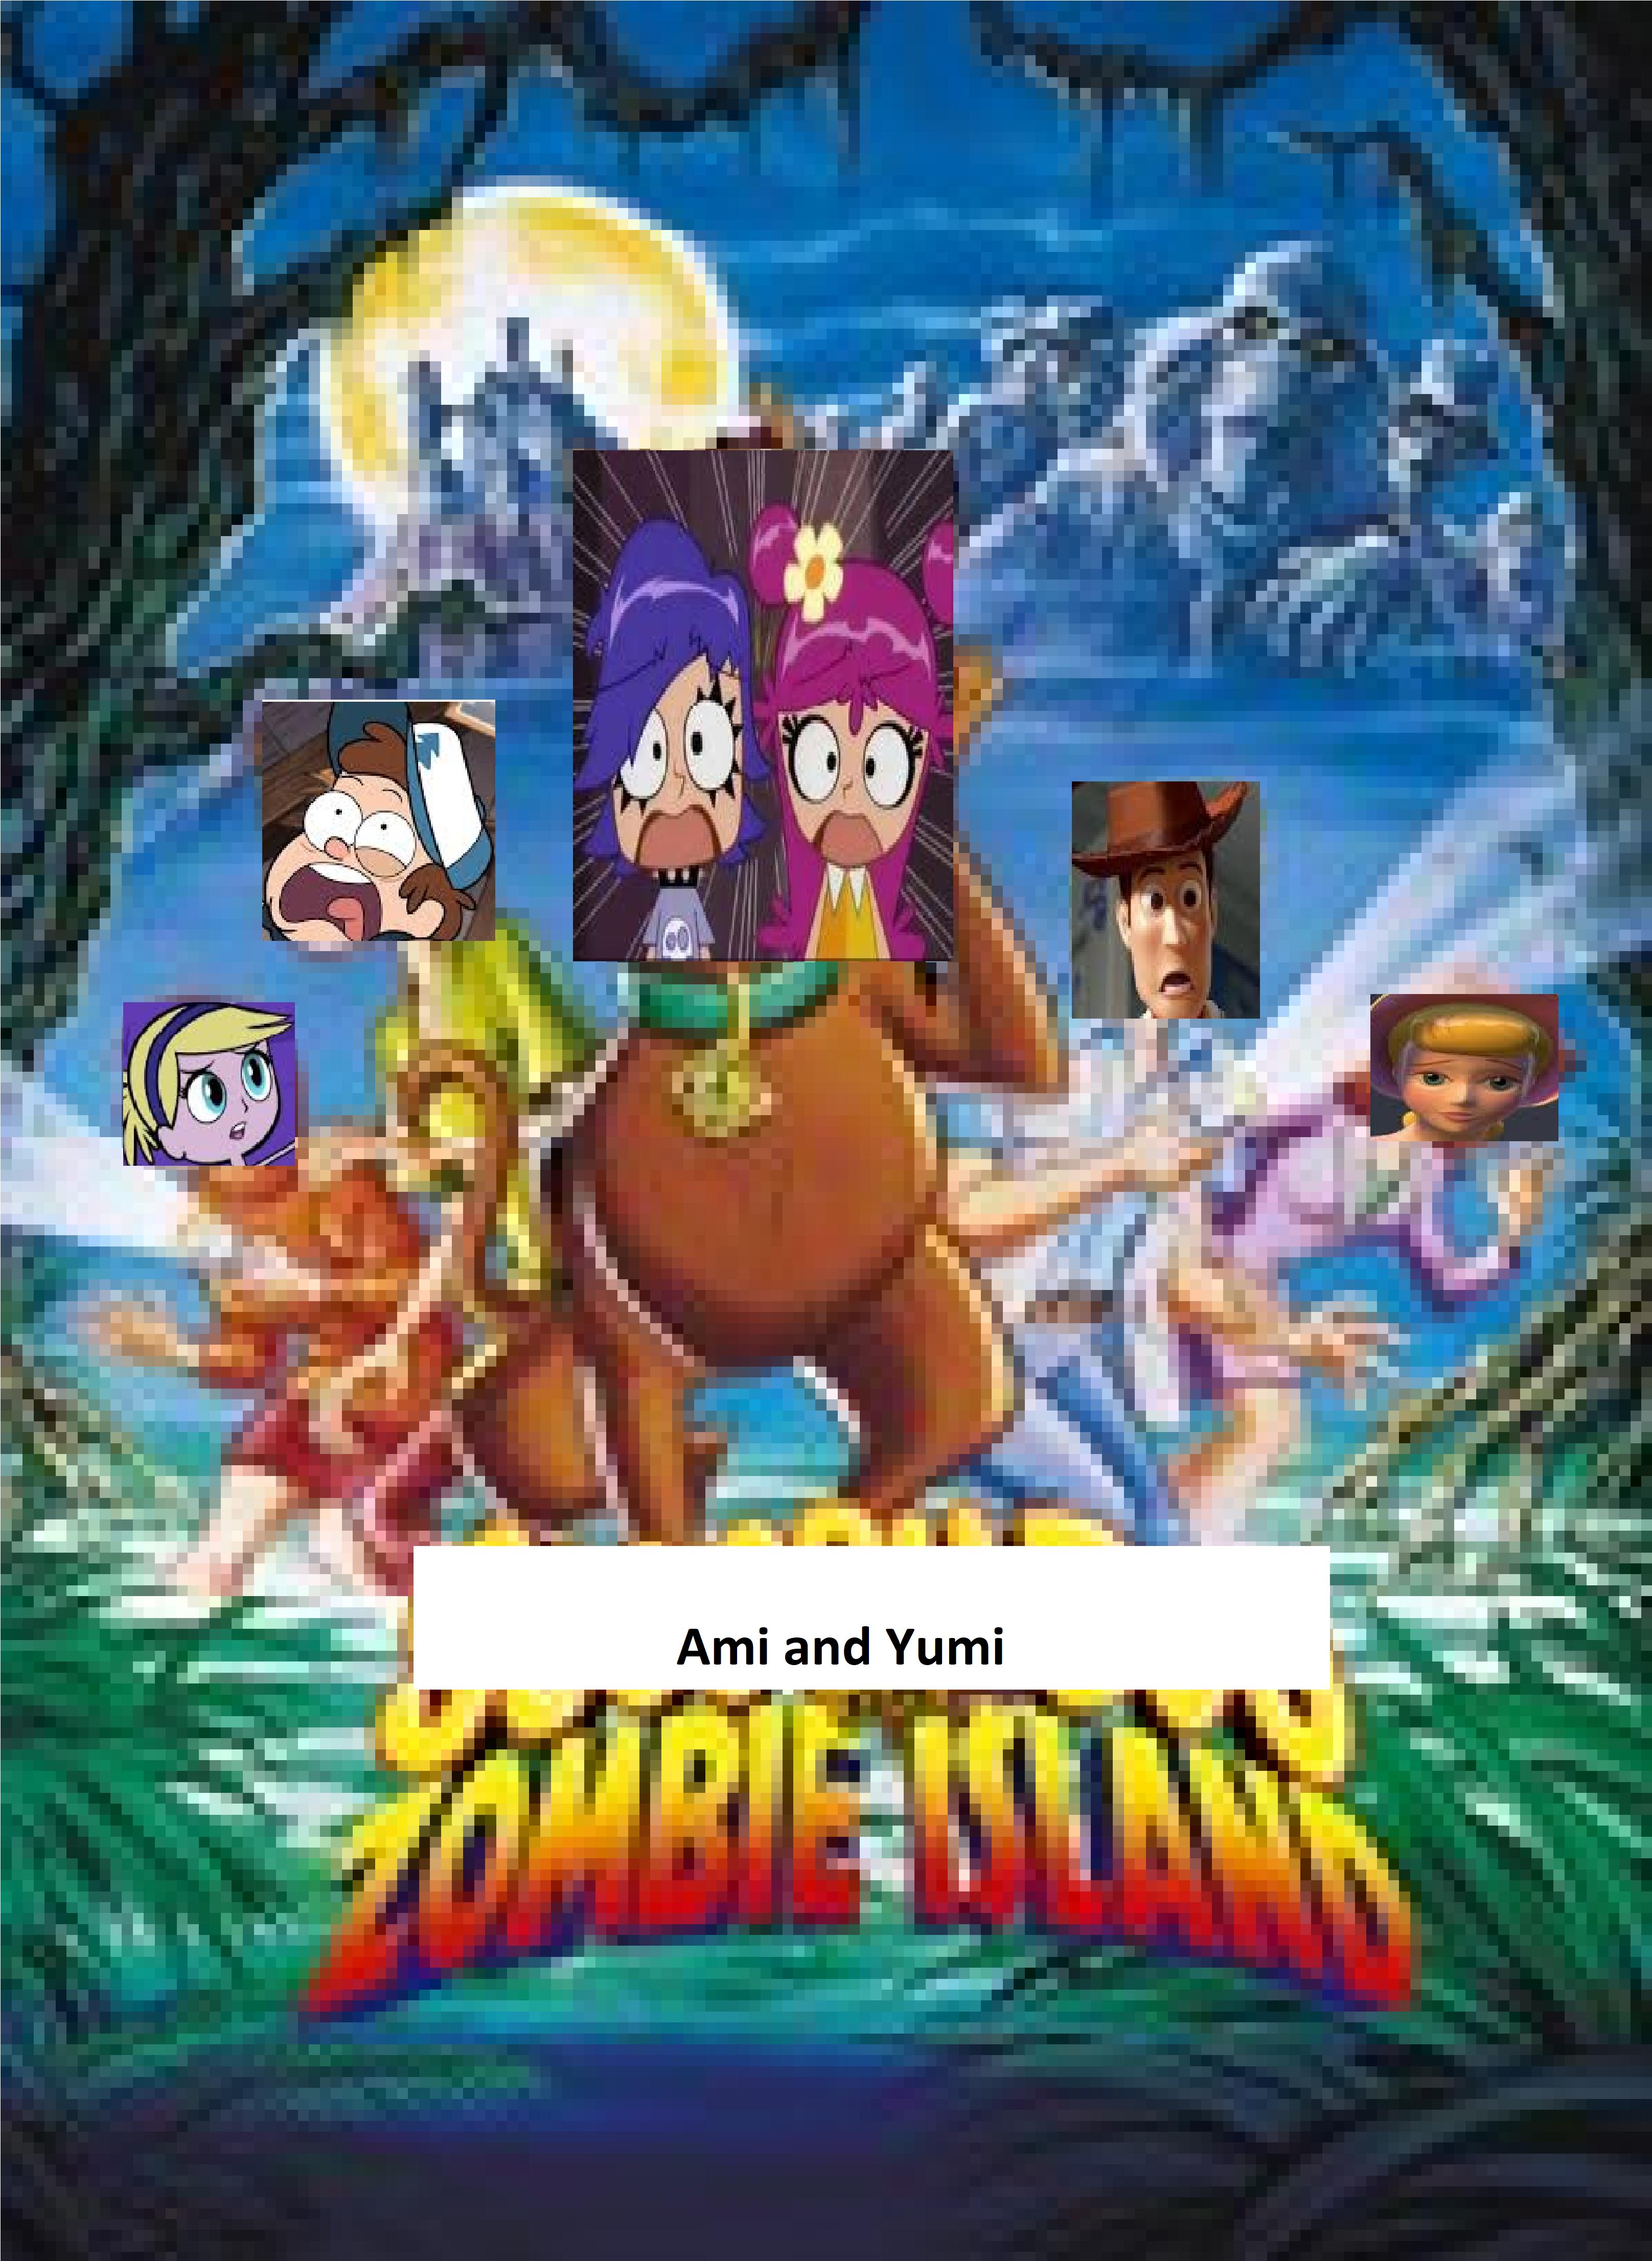 Ami and Yumi on Zombie Island